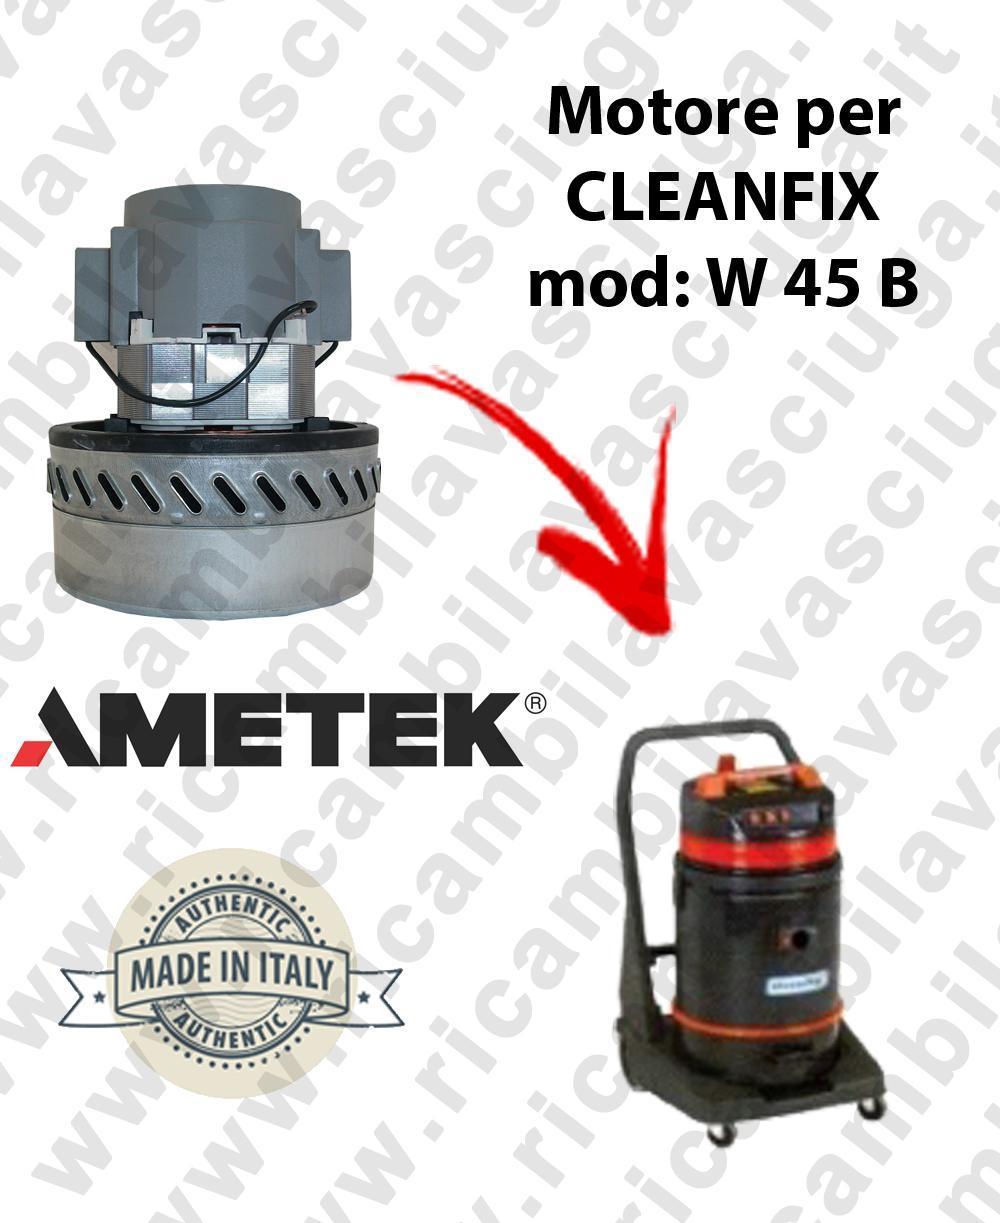 W 45 B AMETEK vacuum motor for wet and dry vacuum cleaner CLEANFIX